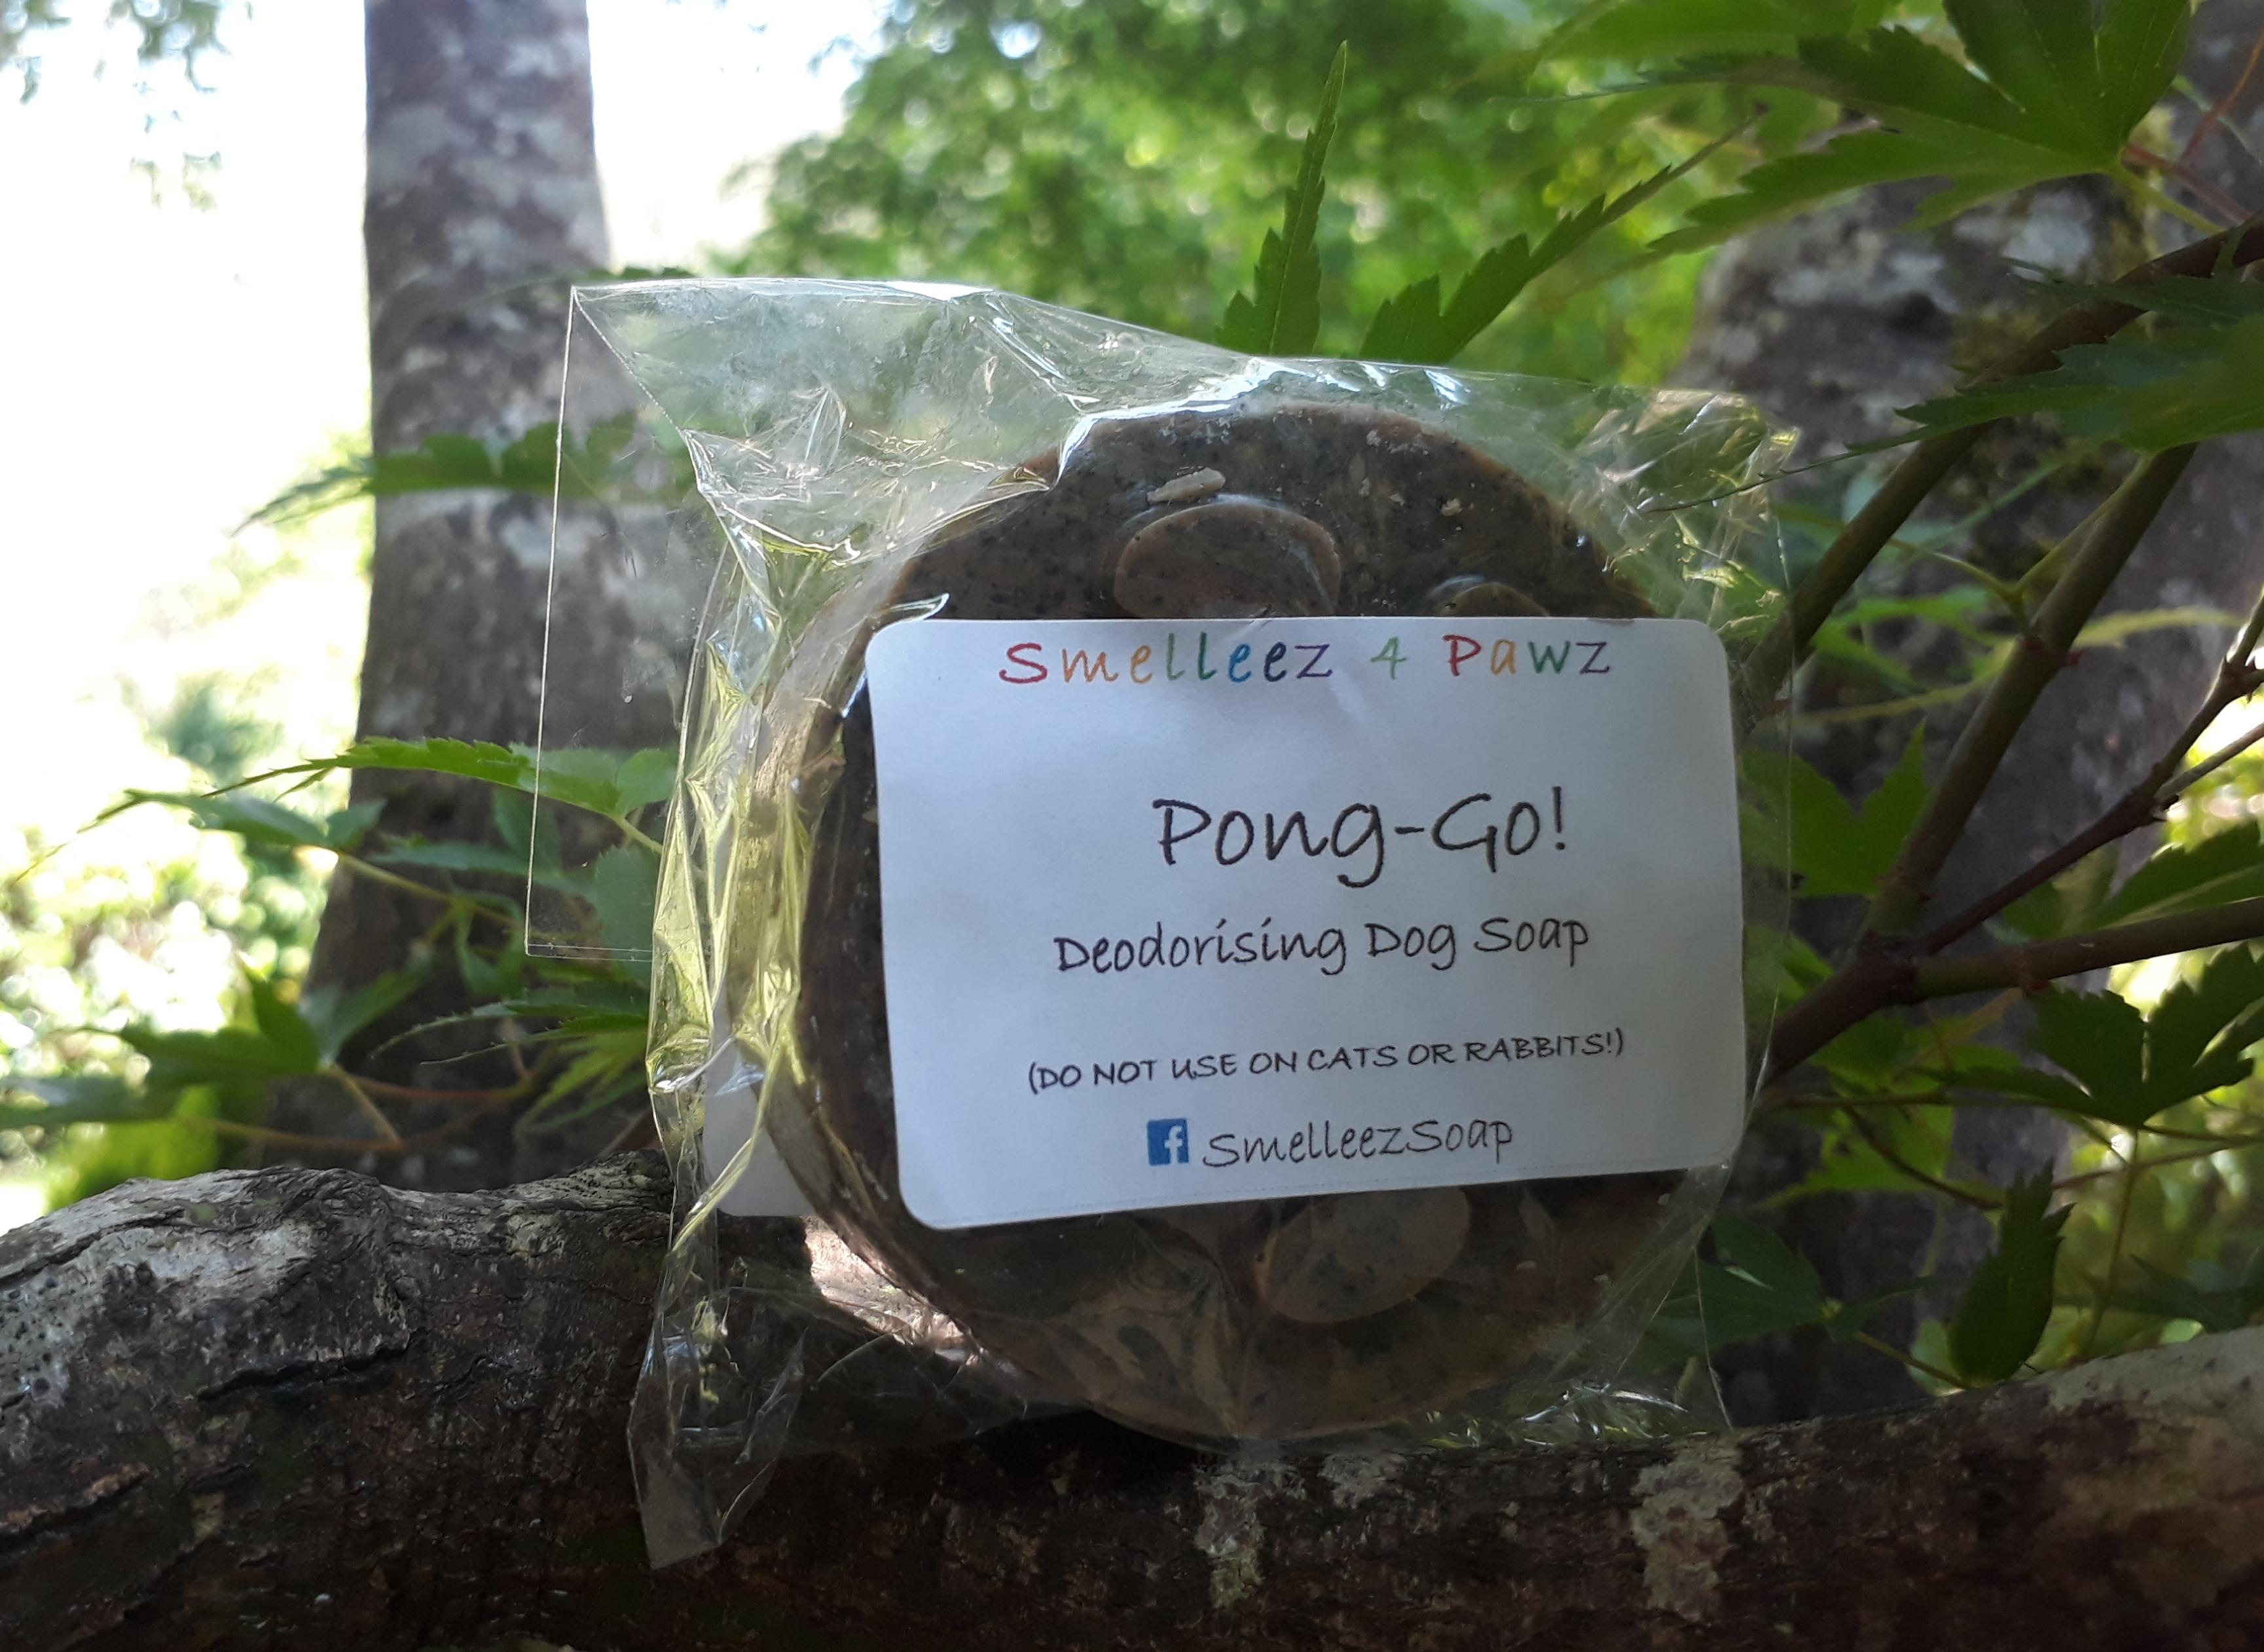 Pong-Go!